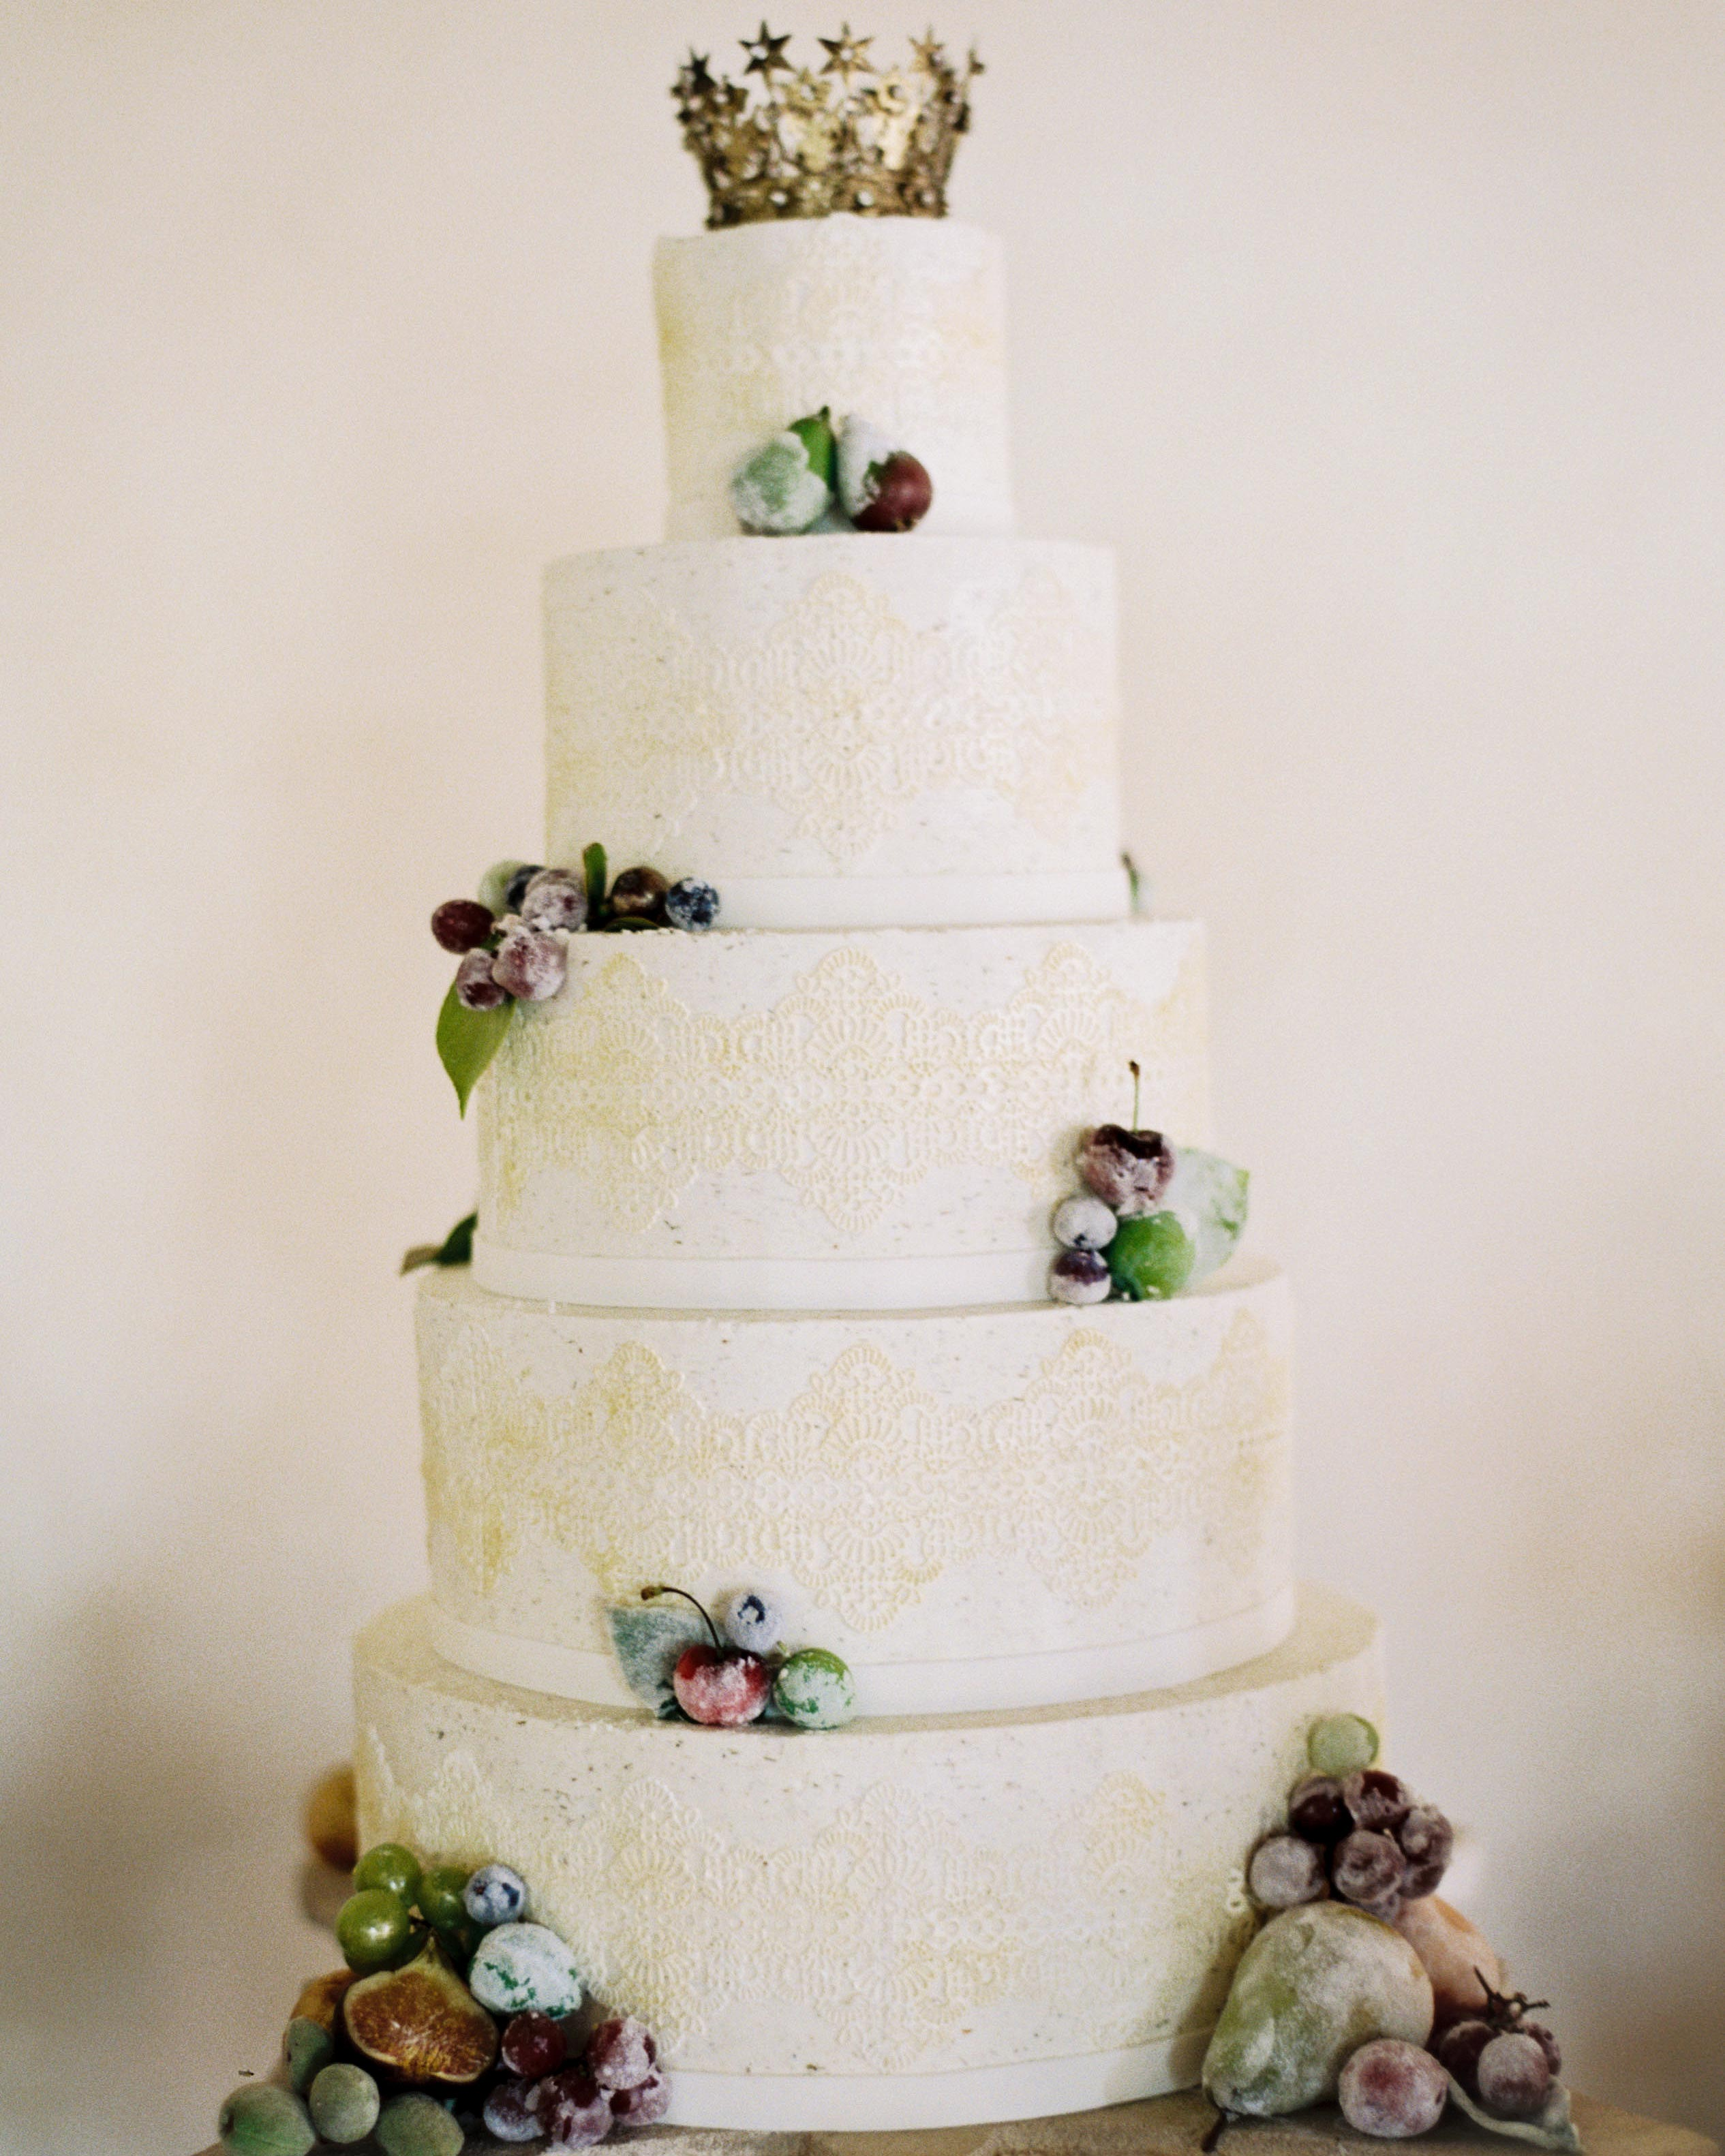 ginny-andrew-wedding-cake-0731-s112676-0216.jpg